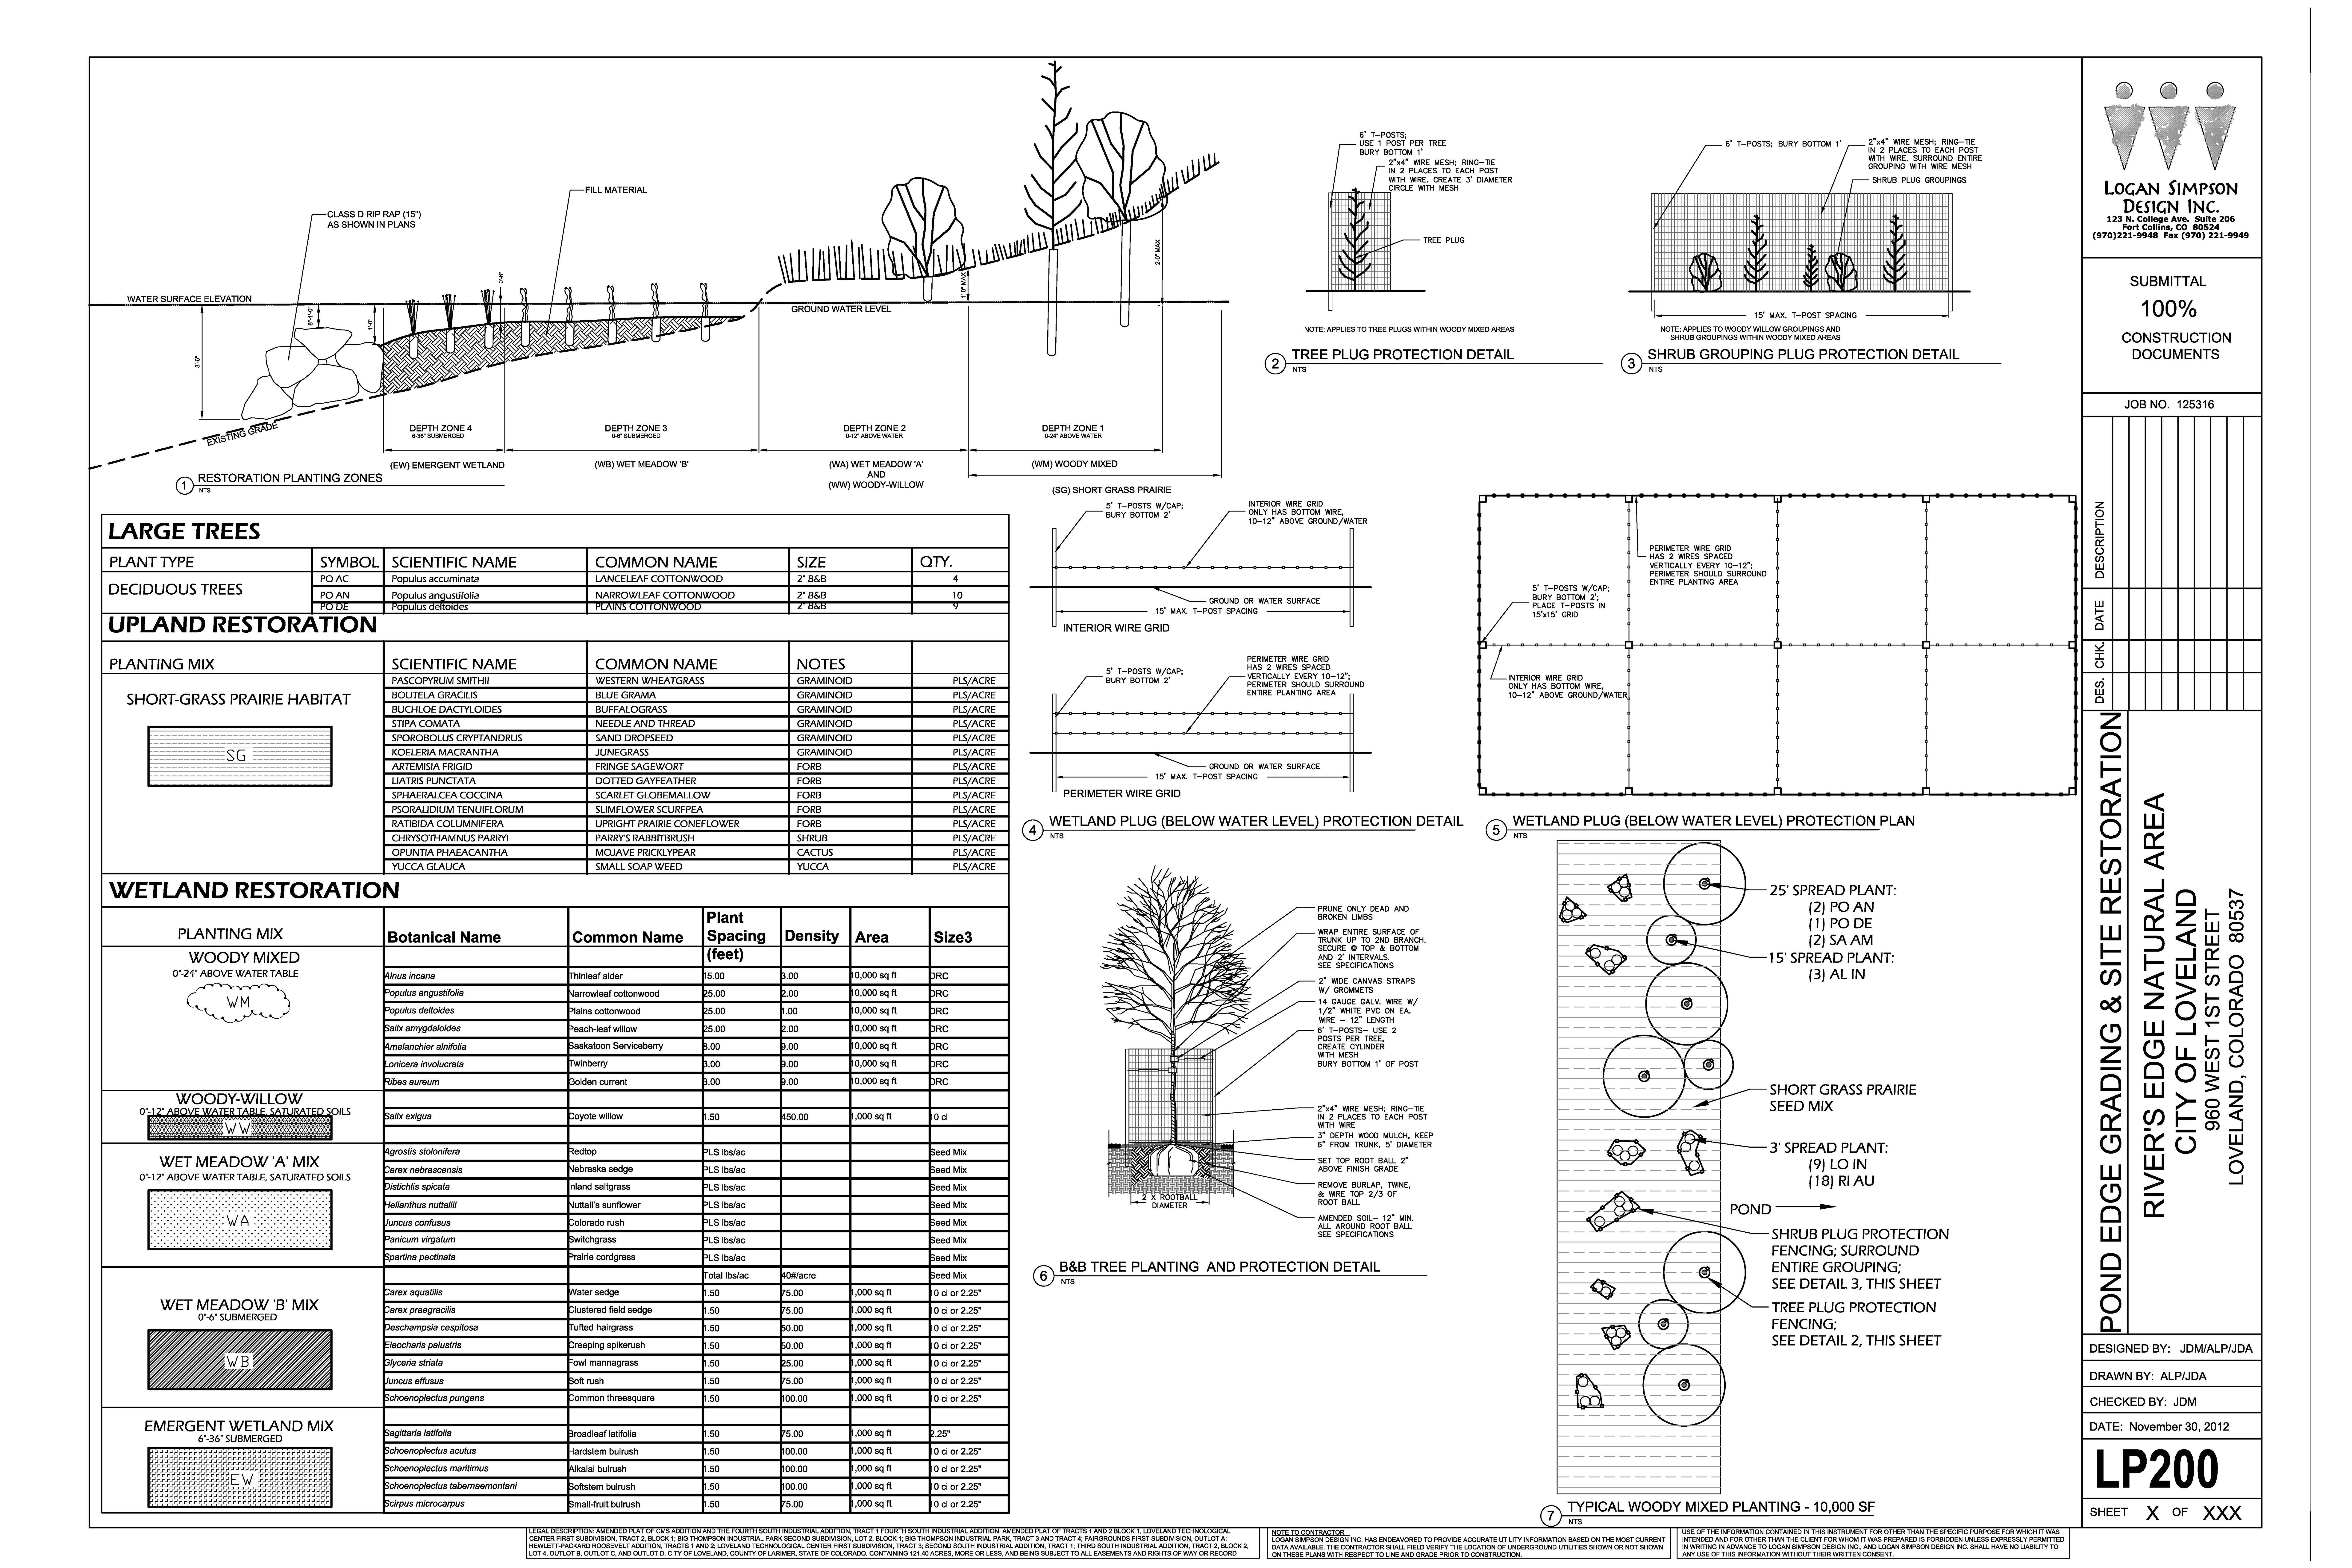 Wetland/riparian plan sheet